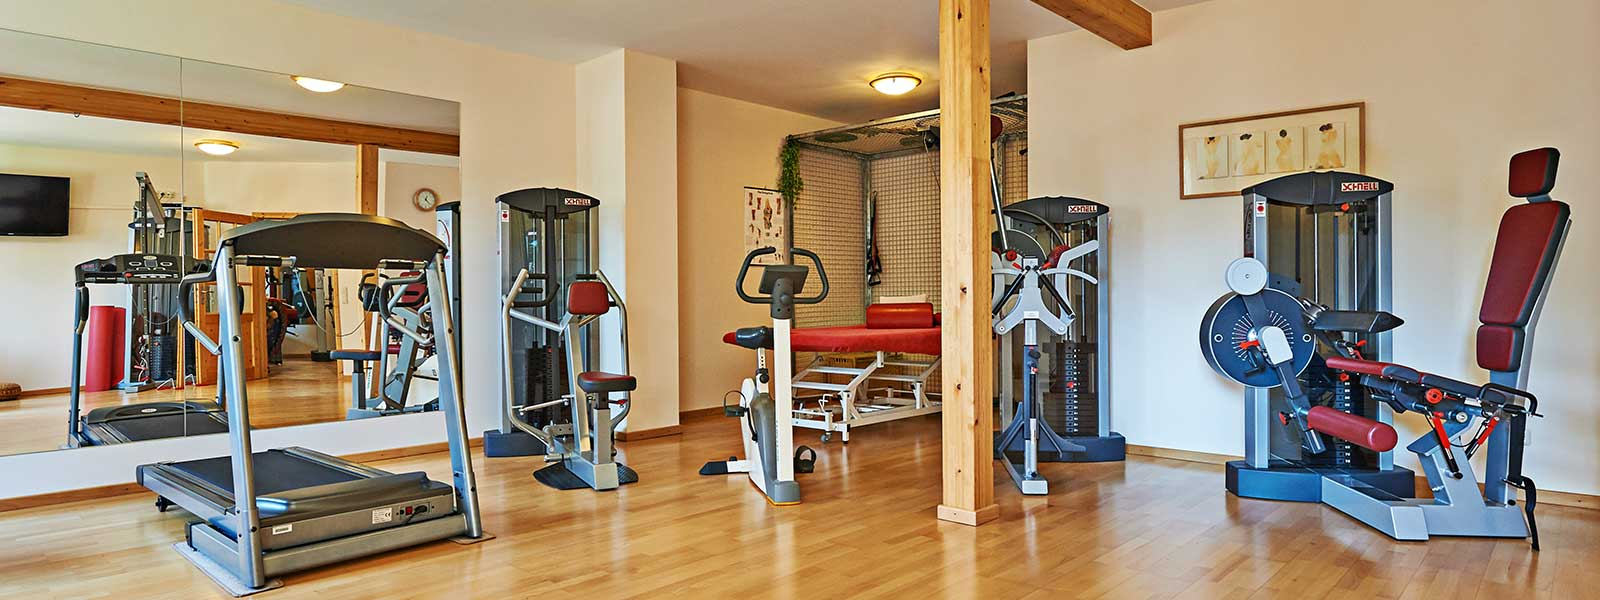 physiotherapie-seiwald-grassau